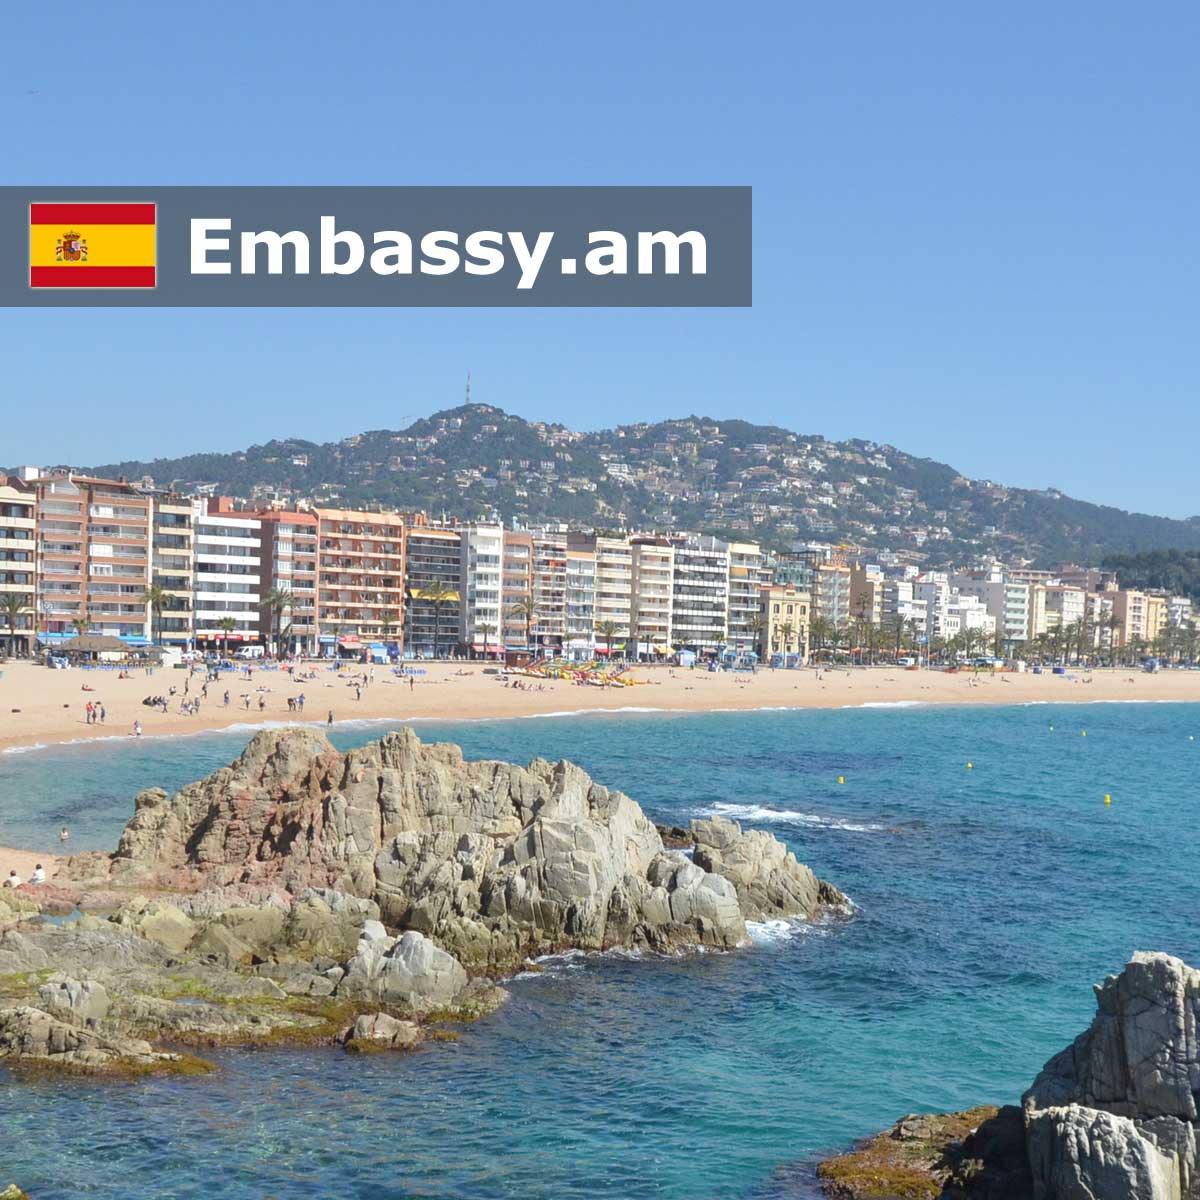 Lloret de Mar - Hotels in Spain - Embassy.am